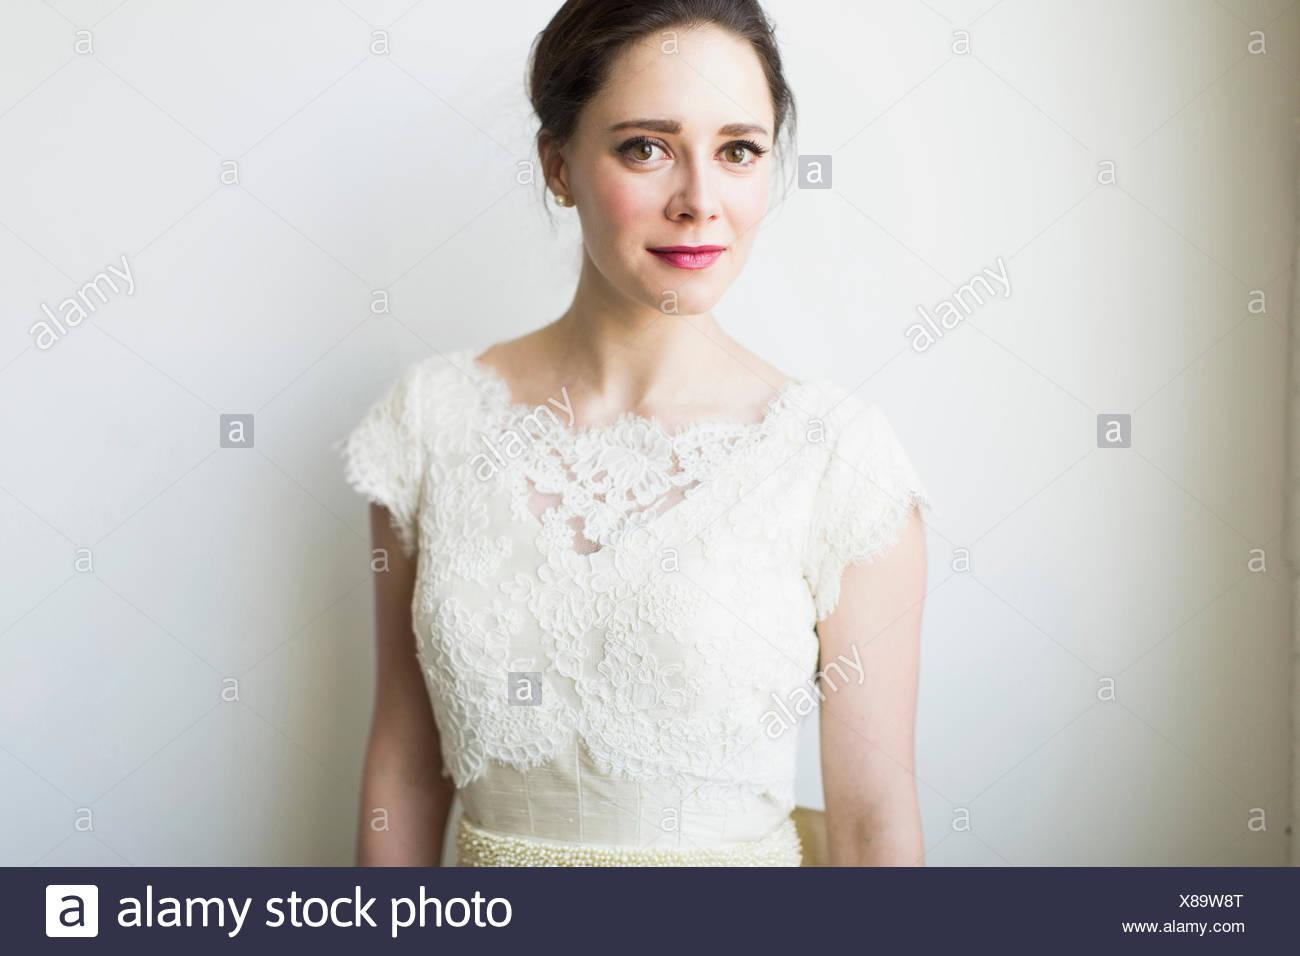 Studio-Porträt der Braut Stockbild